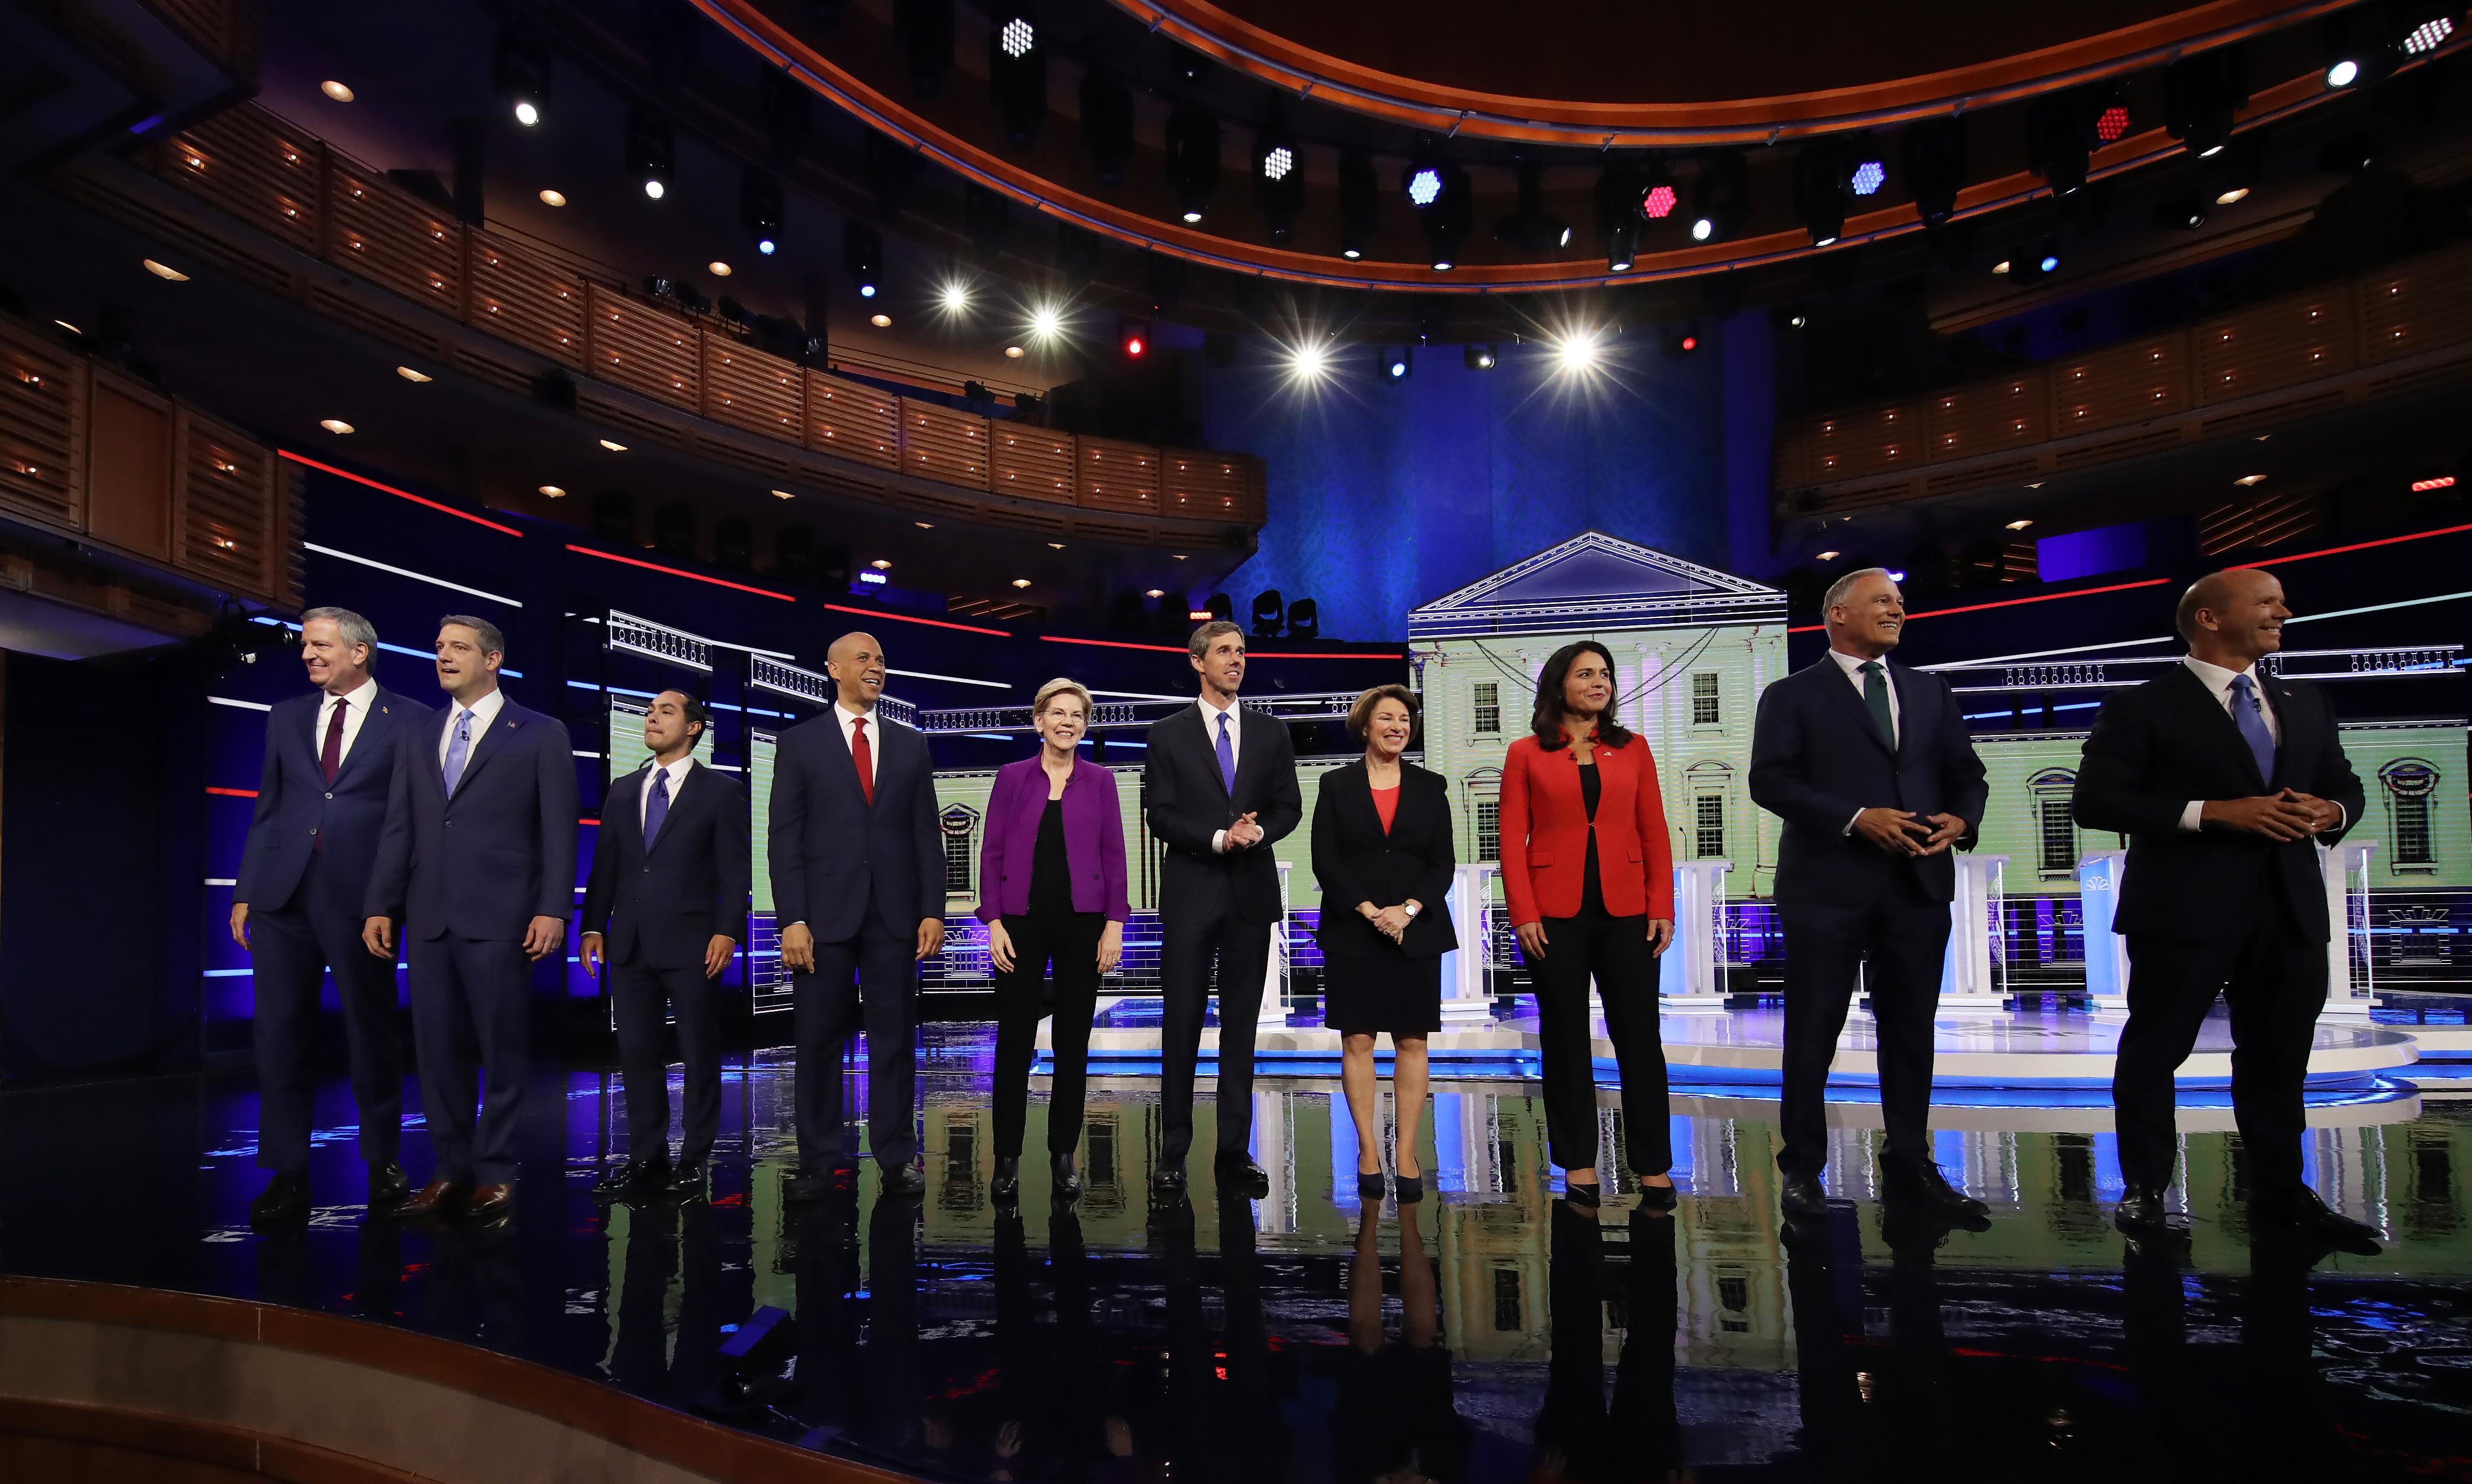 US briefing: Democratic debate, Trump's G20 threats and migrant deaths